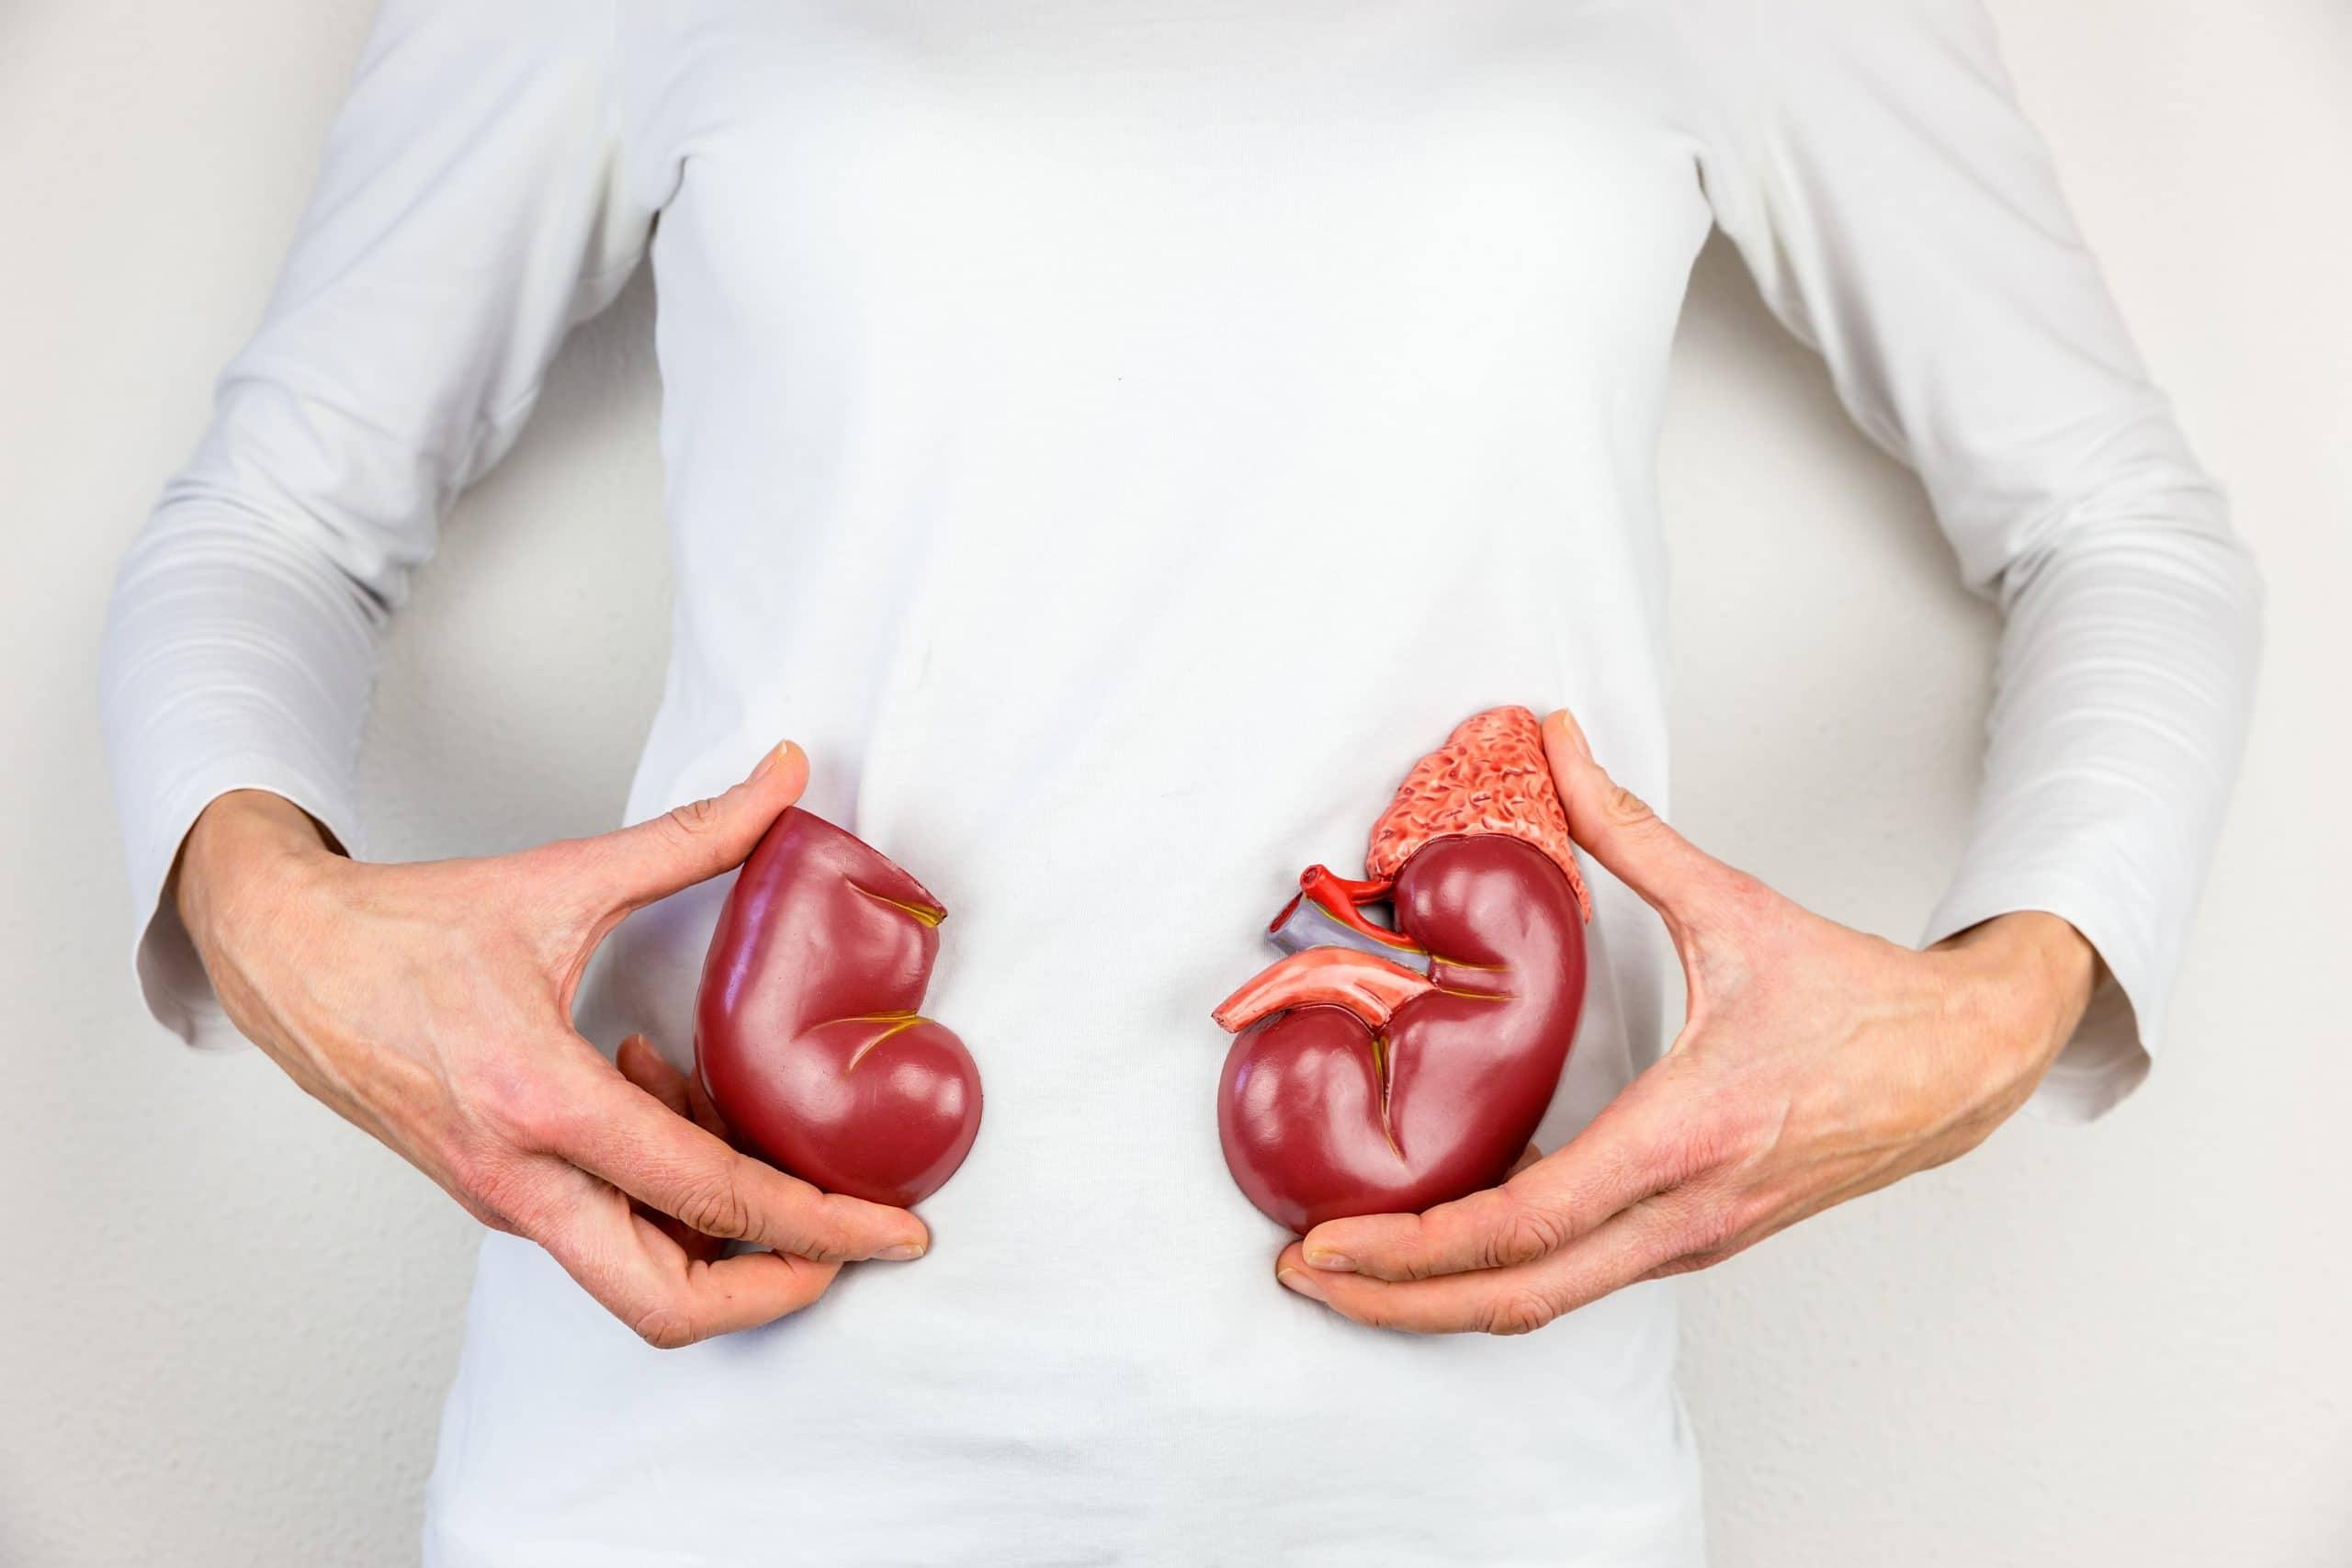 How To Improve Kidney Health